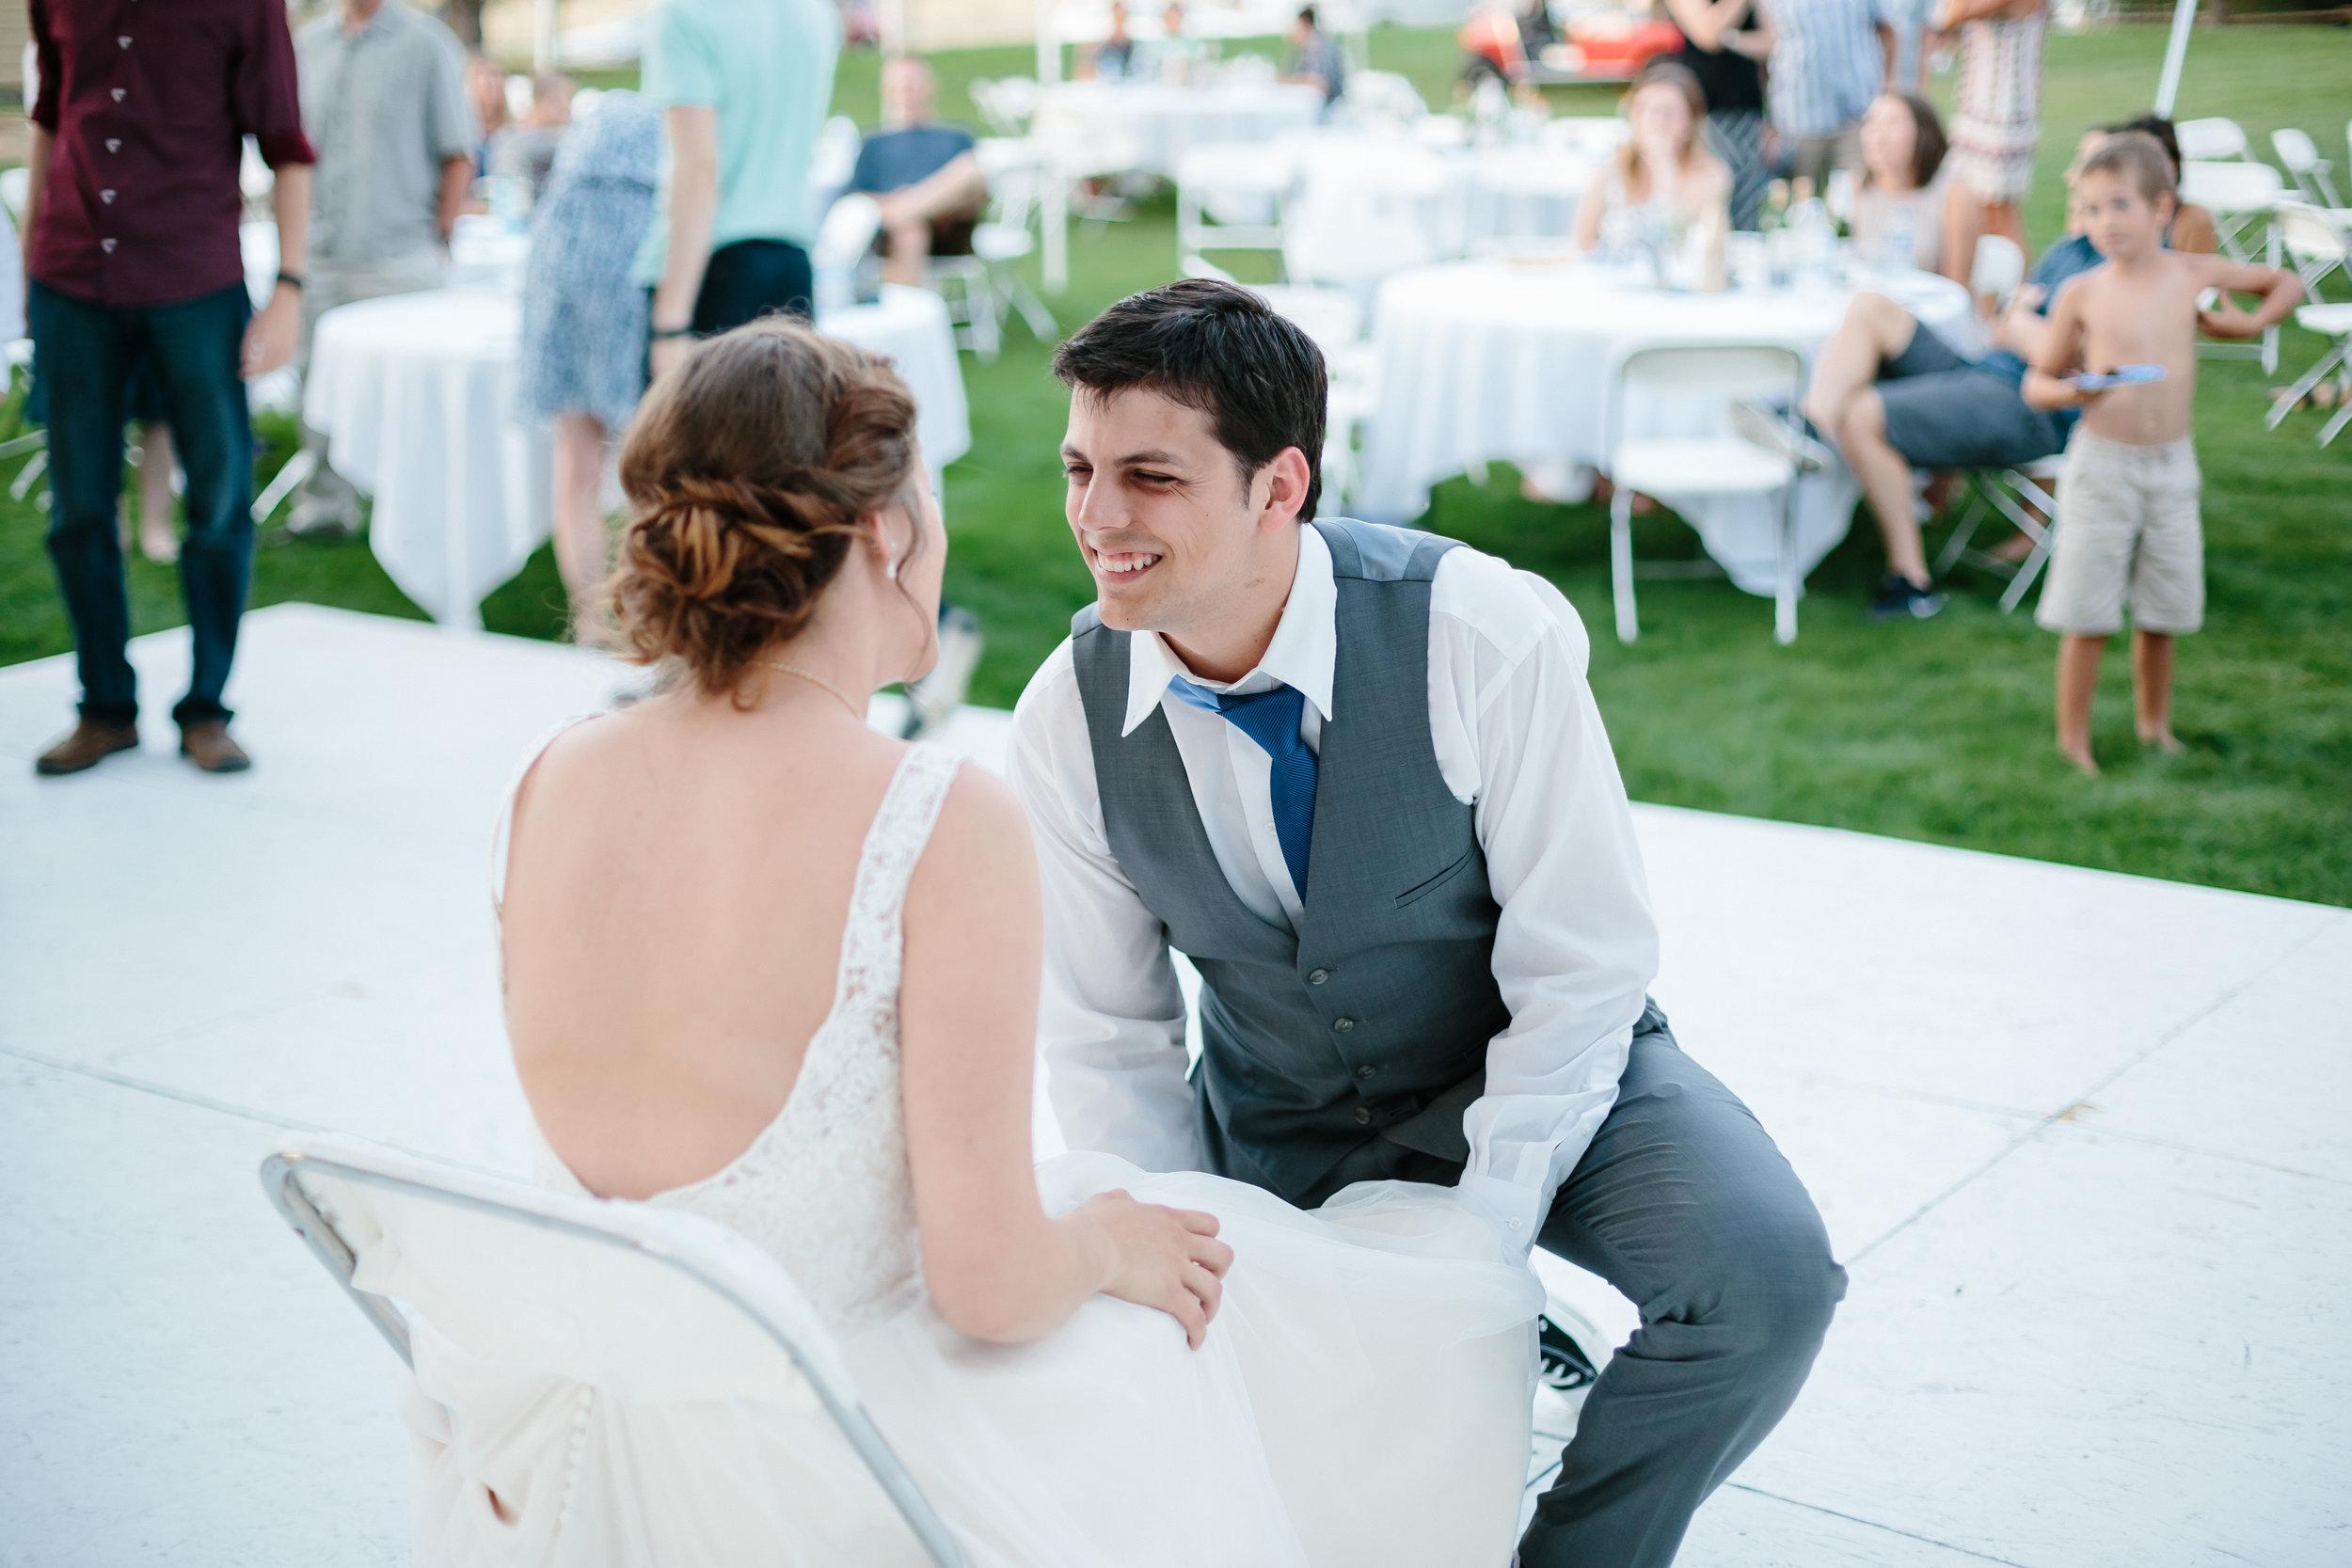 Jordan & Shantel Married - Idaho - Corrie Mick Photography-347.jpg